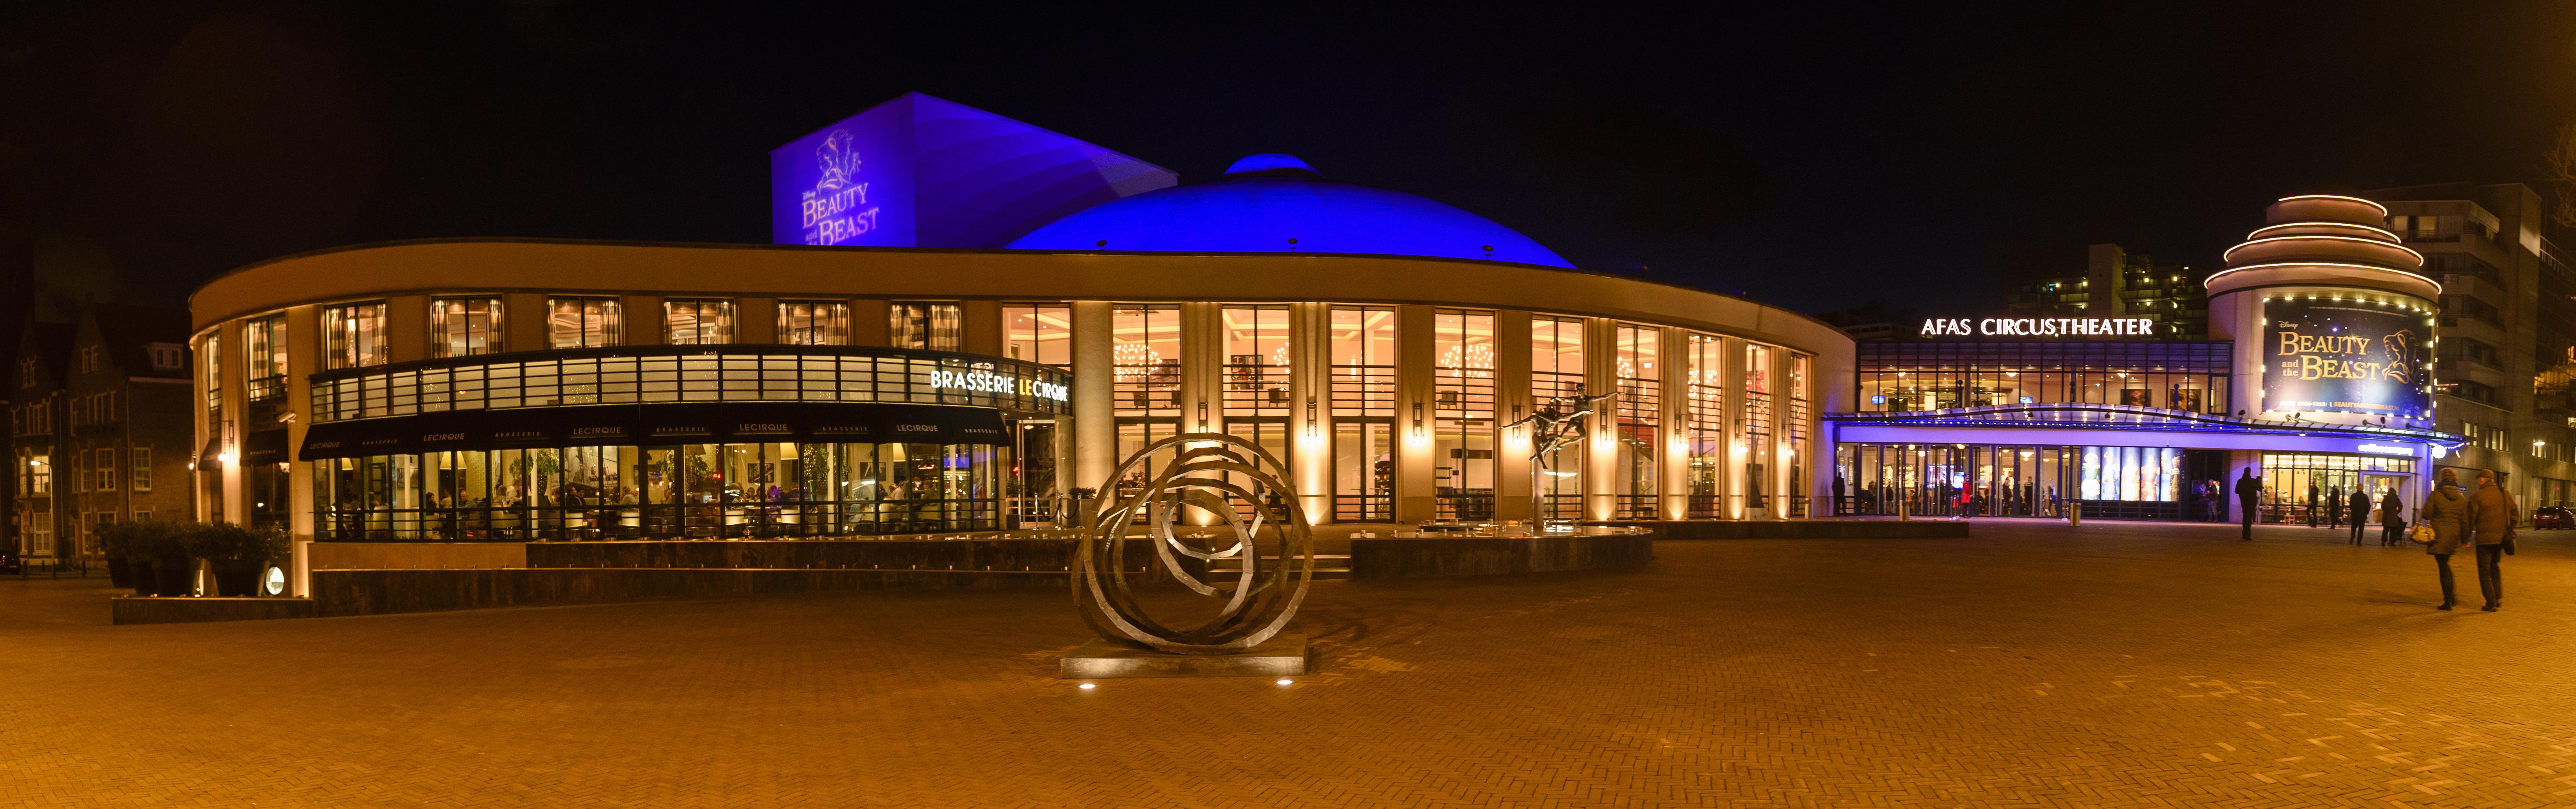 AFAS Circustheater, Beauty and the Beast.jpg